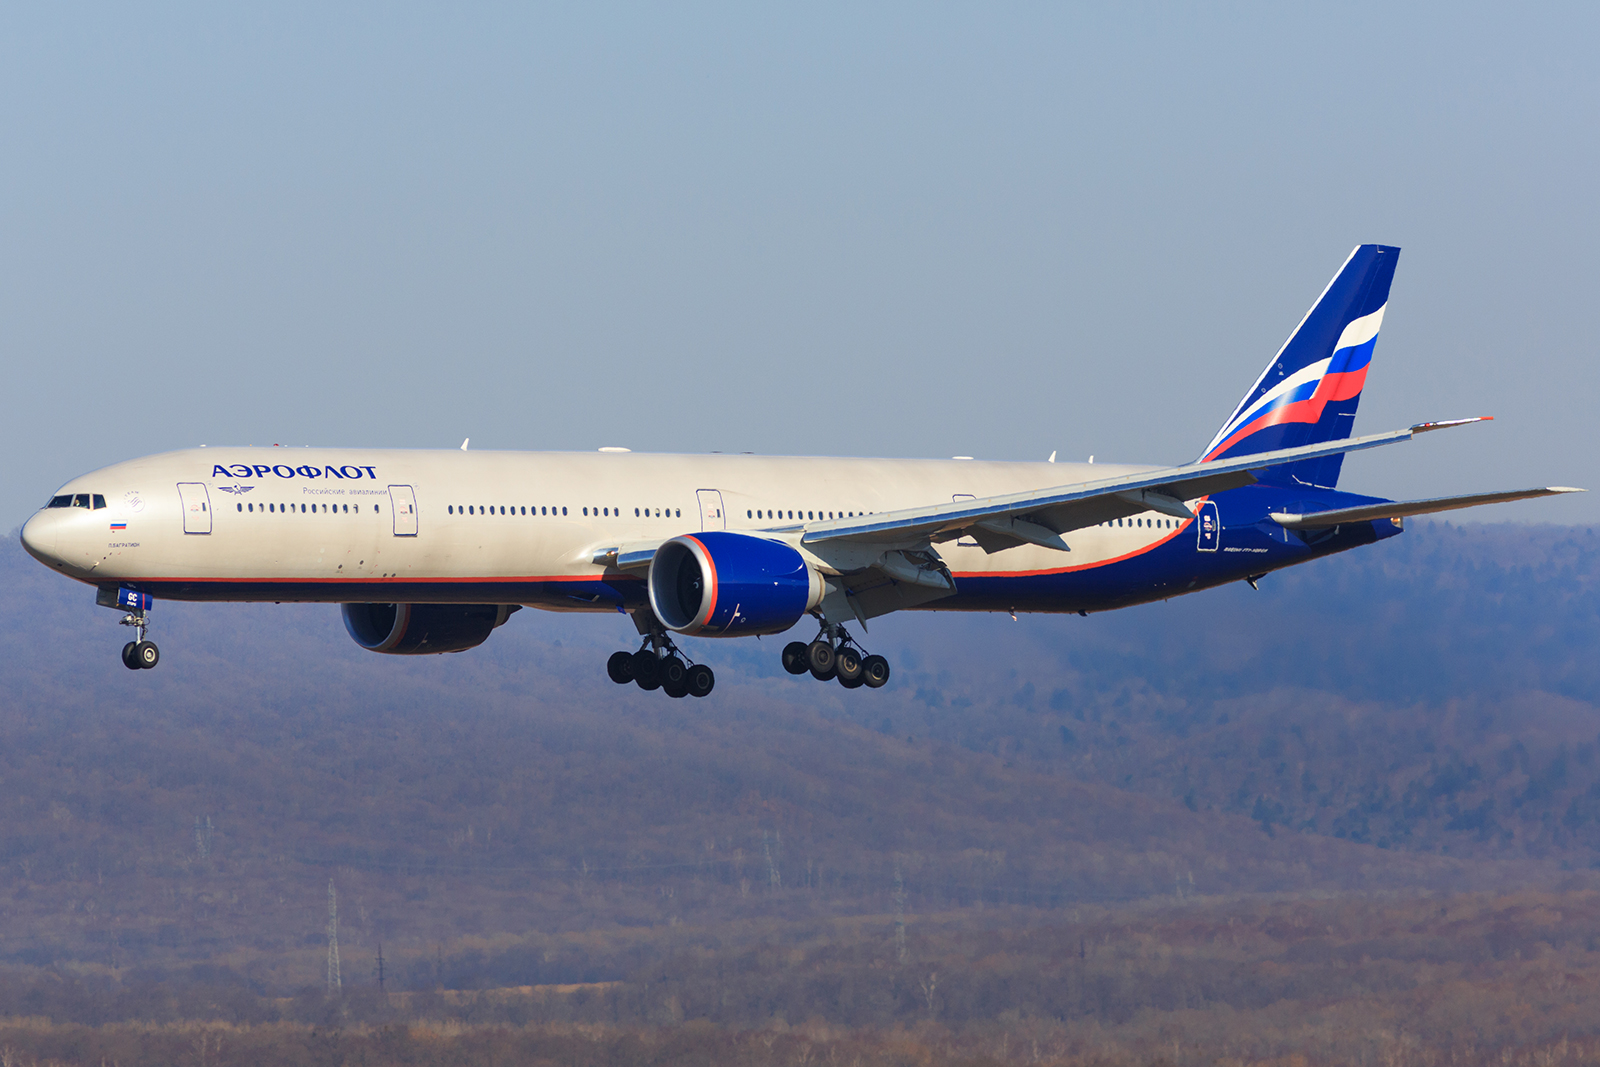 https://ru.wikipedia.org/wiki/Файл:Aeroflot_-_Russian_Airlines,_Boeing_777-300ER,_VP-BGC.jpg